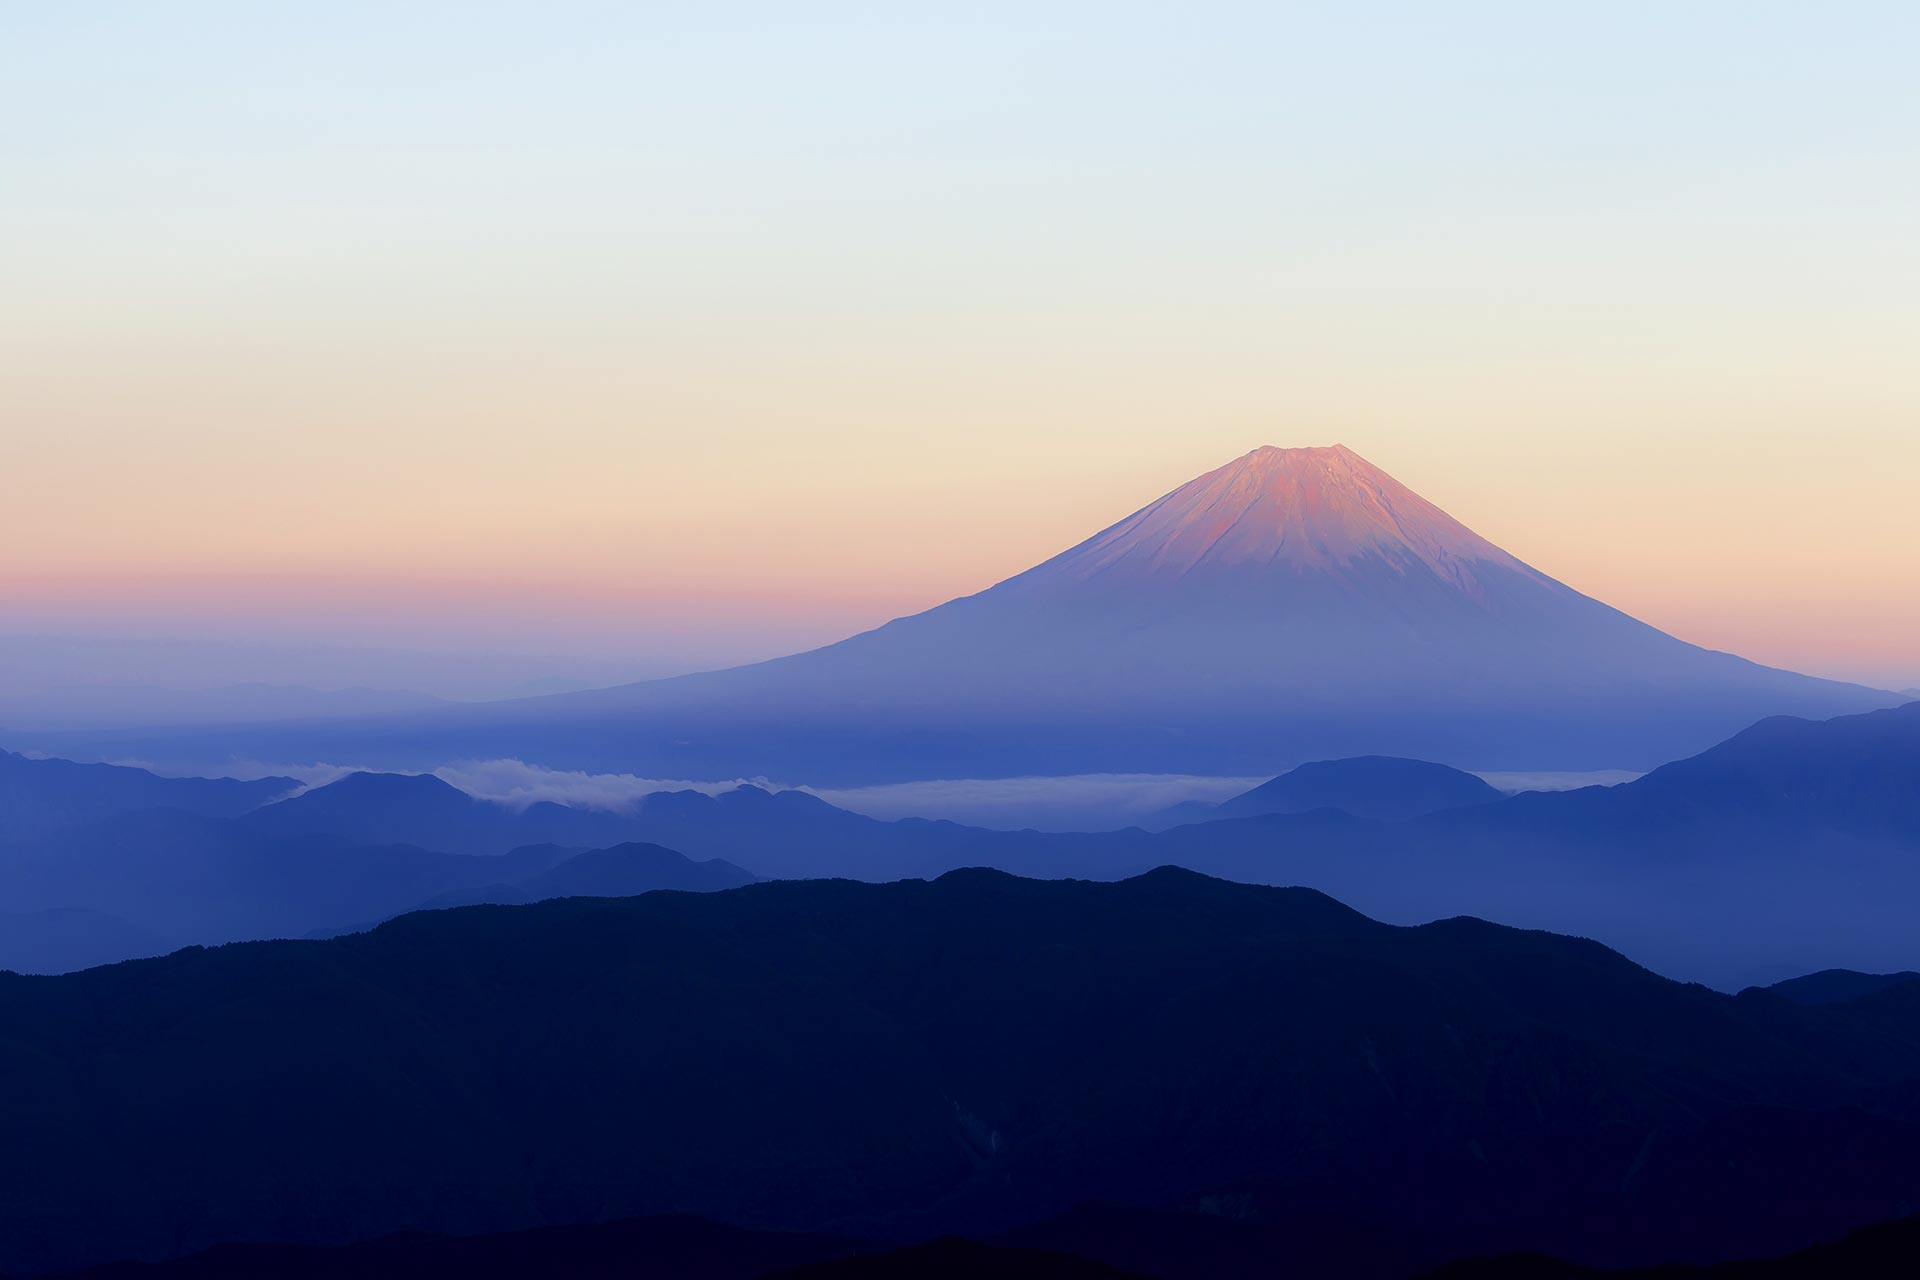 Sonnenuntergang am Mount Fuji